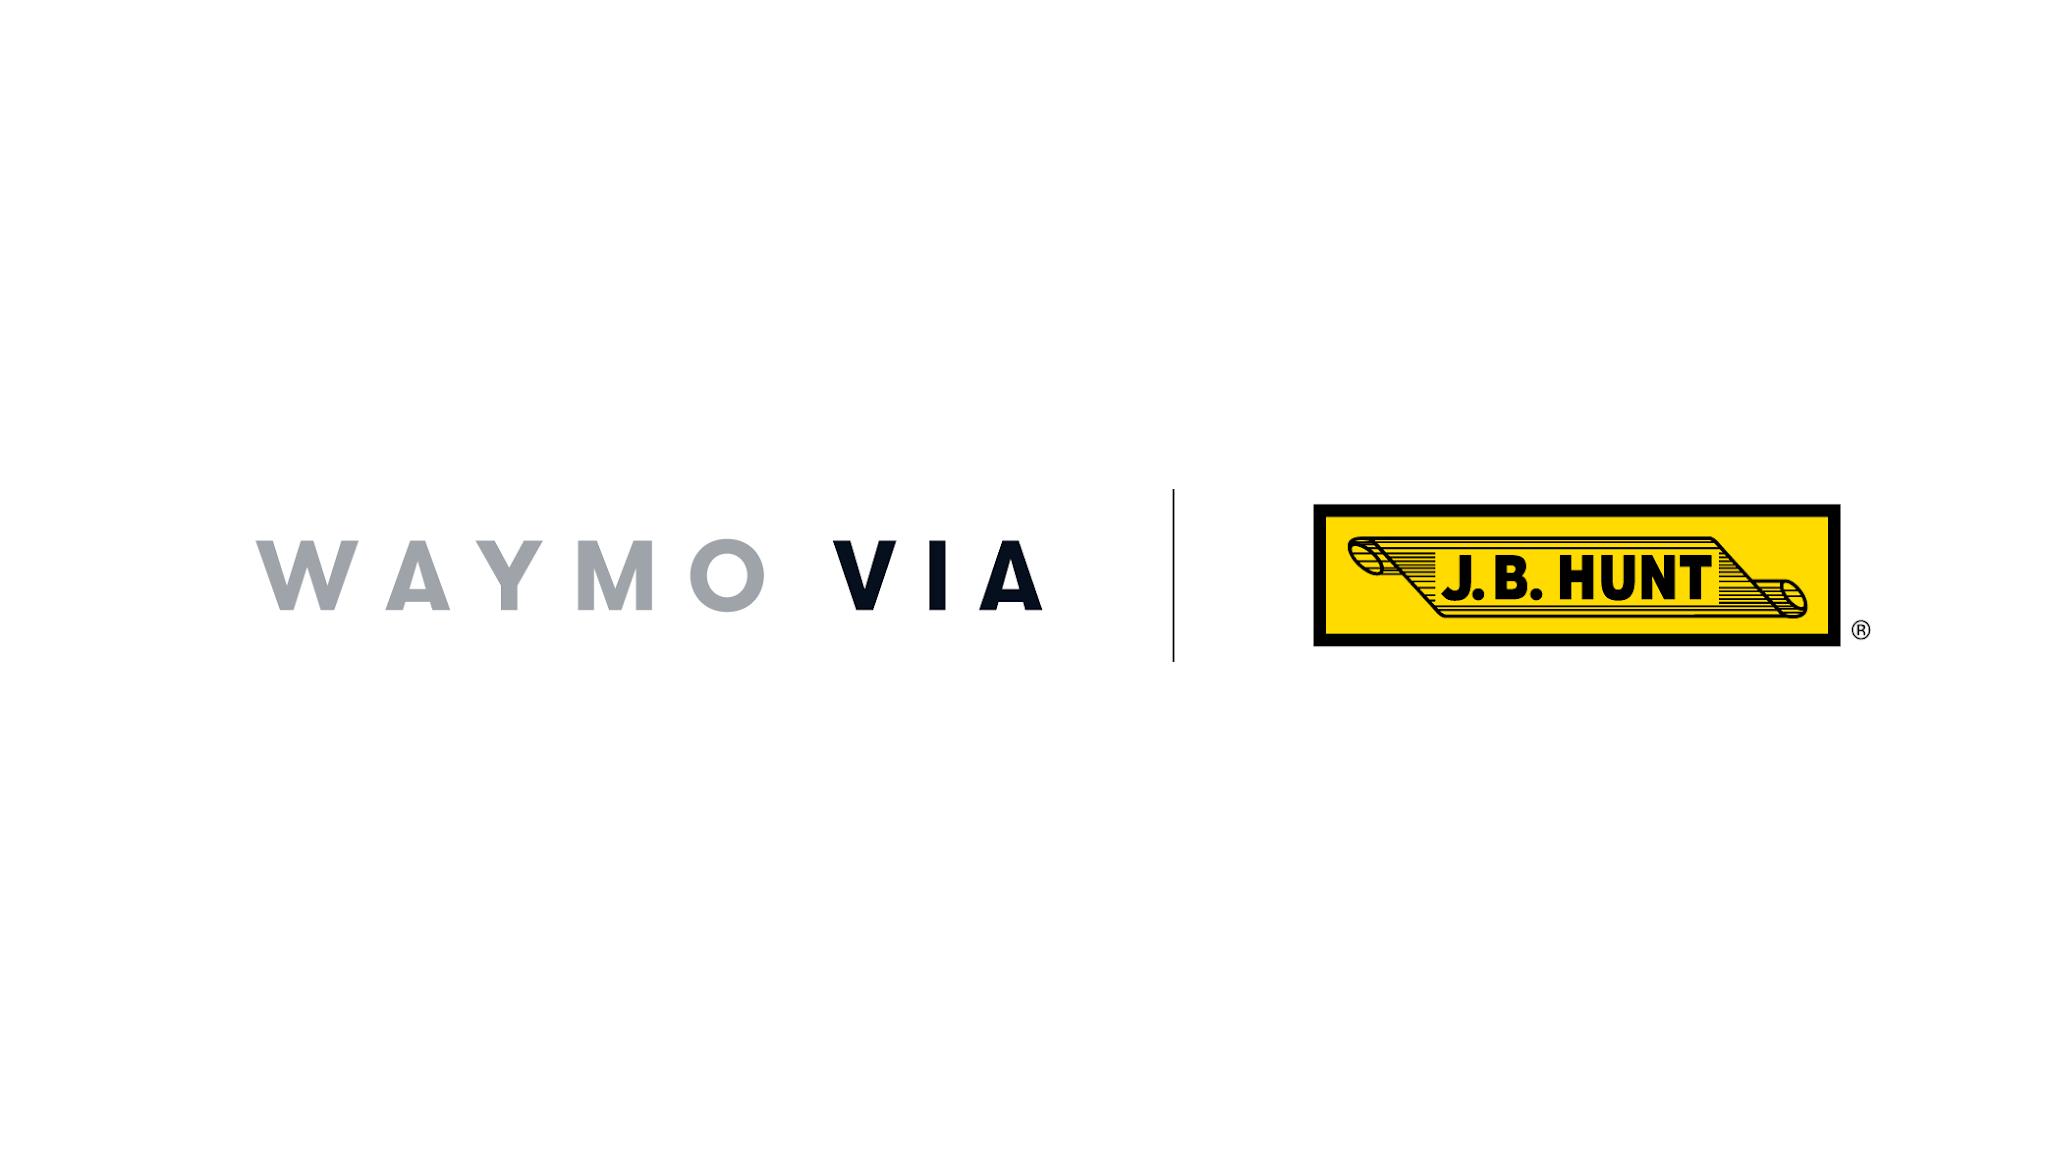 Thumbnail: Waymo and J.B. Hunt